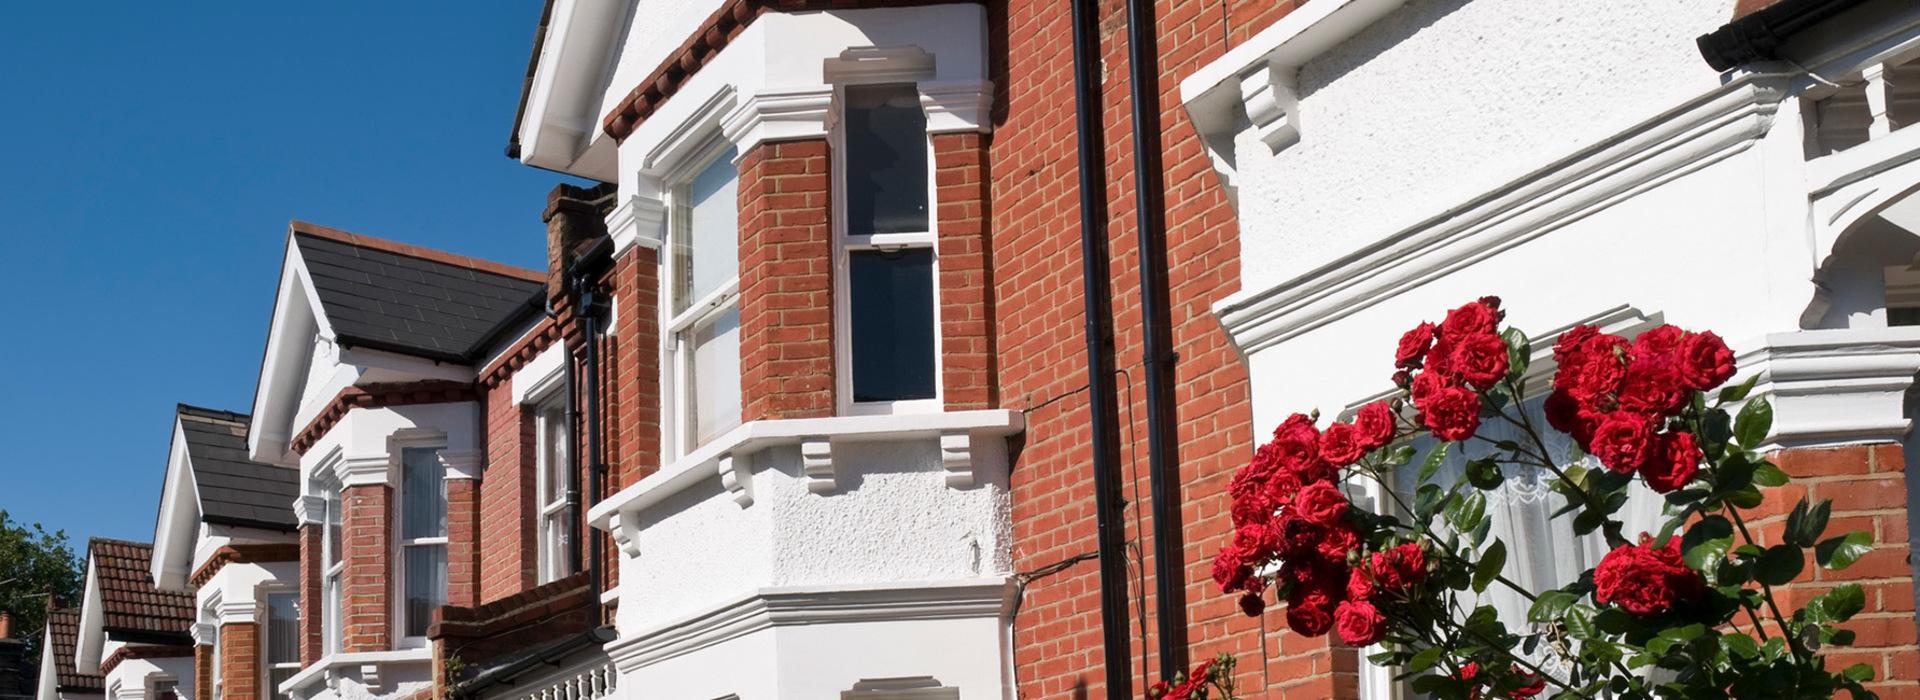 Letting Agent Hertfordshire, Property Management Hertfordshire, Estate Agent Hertfordshire